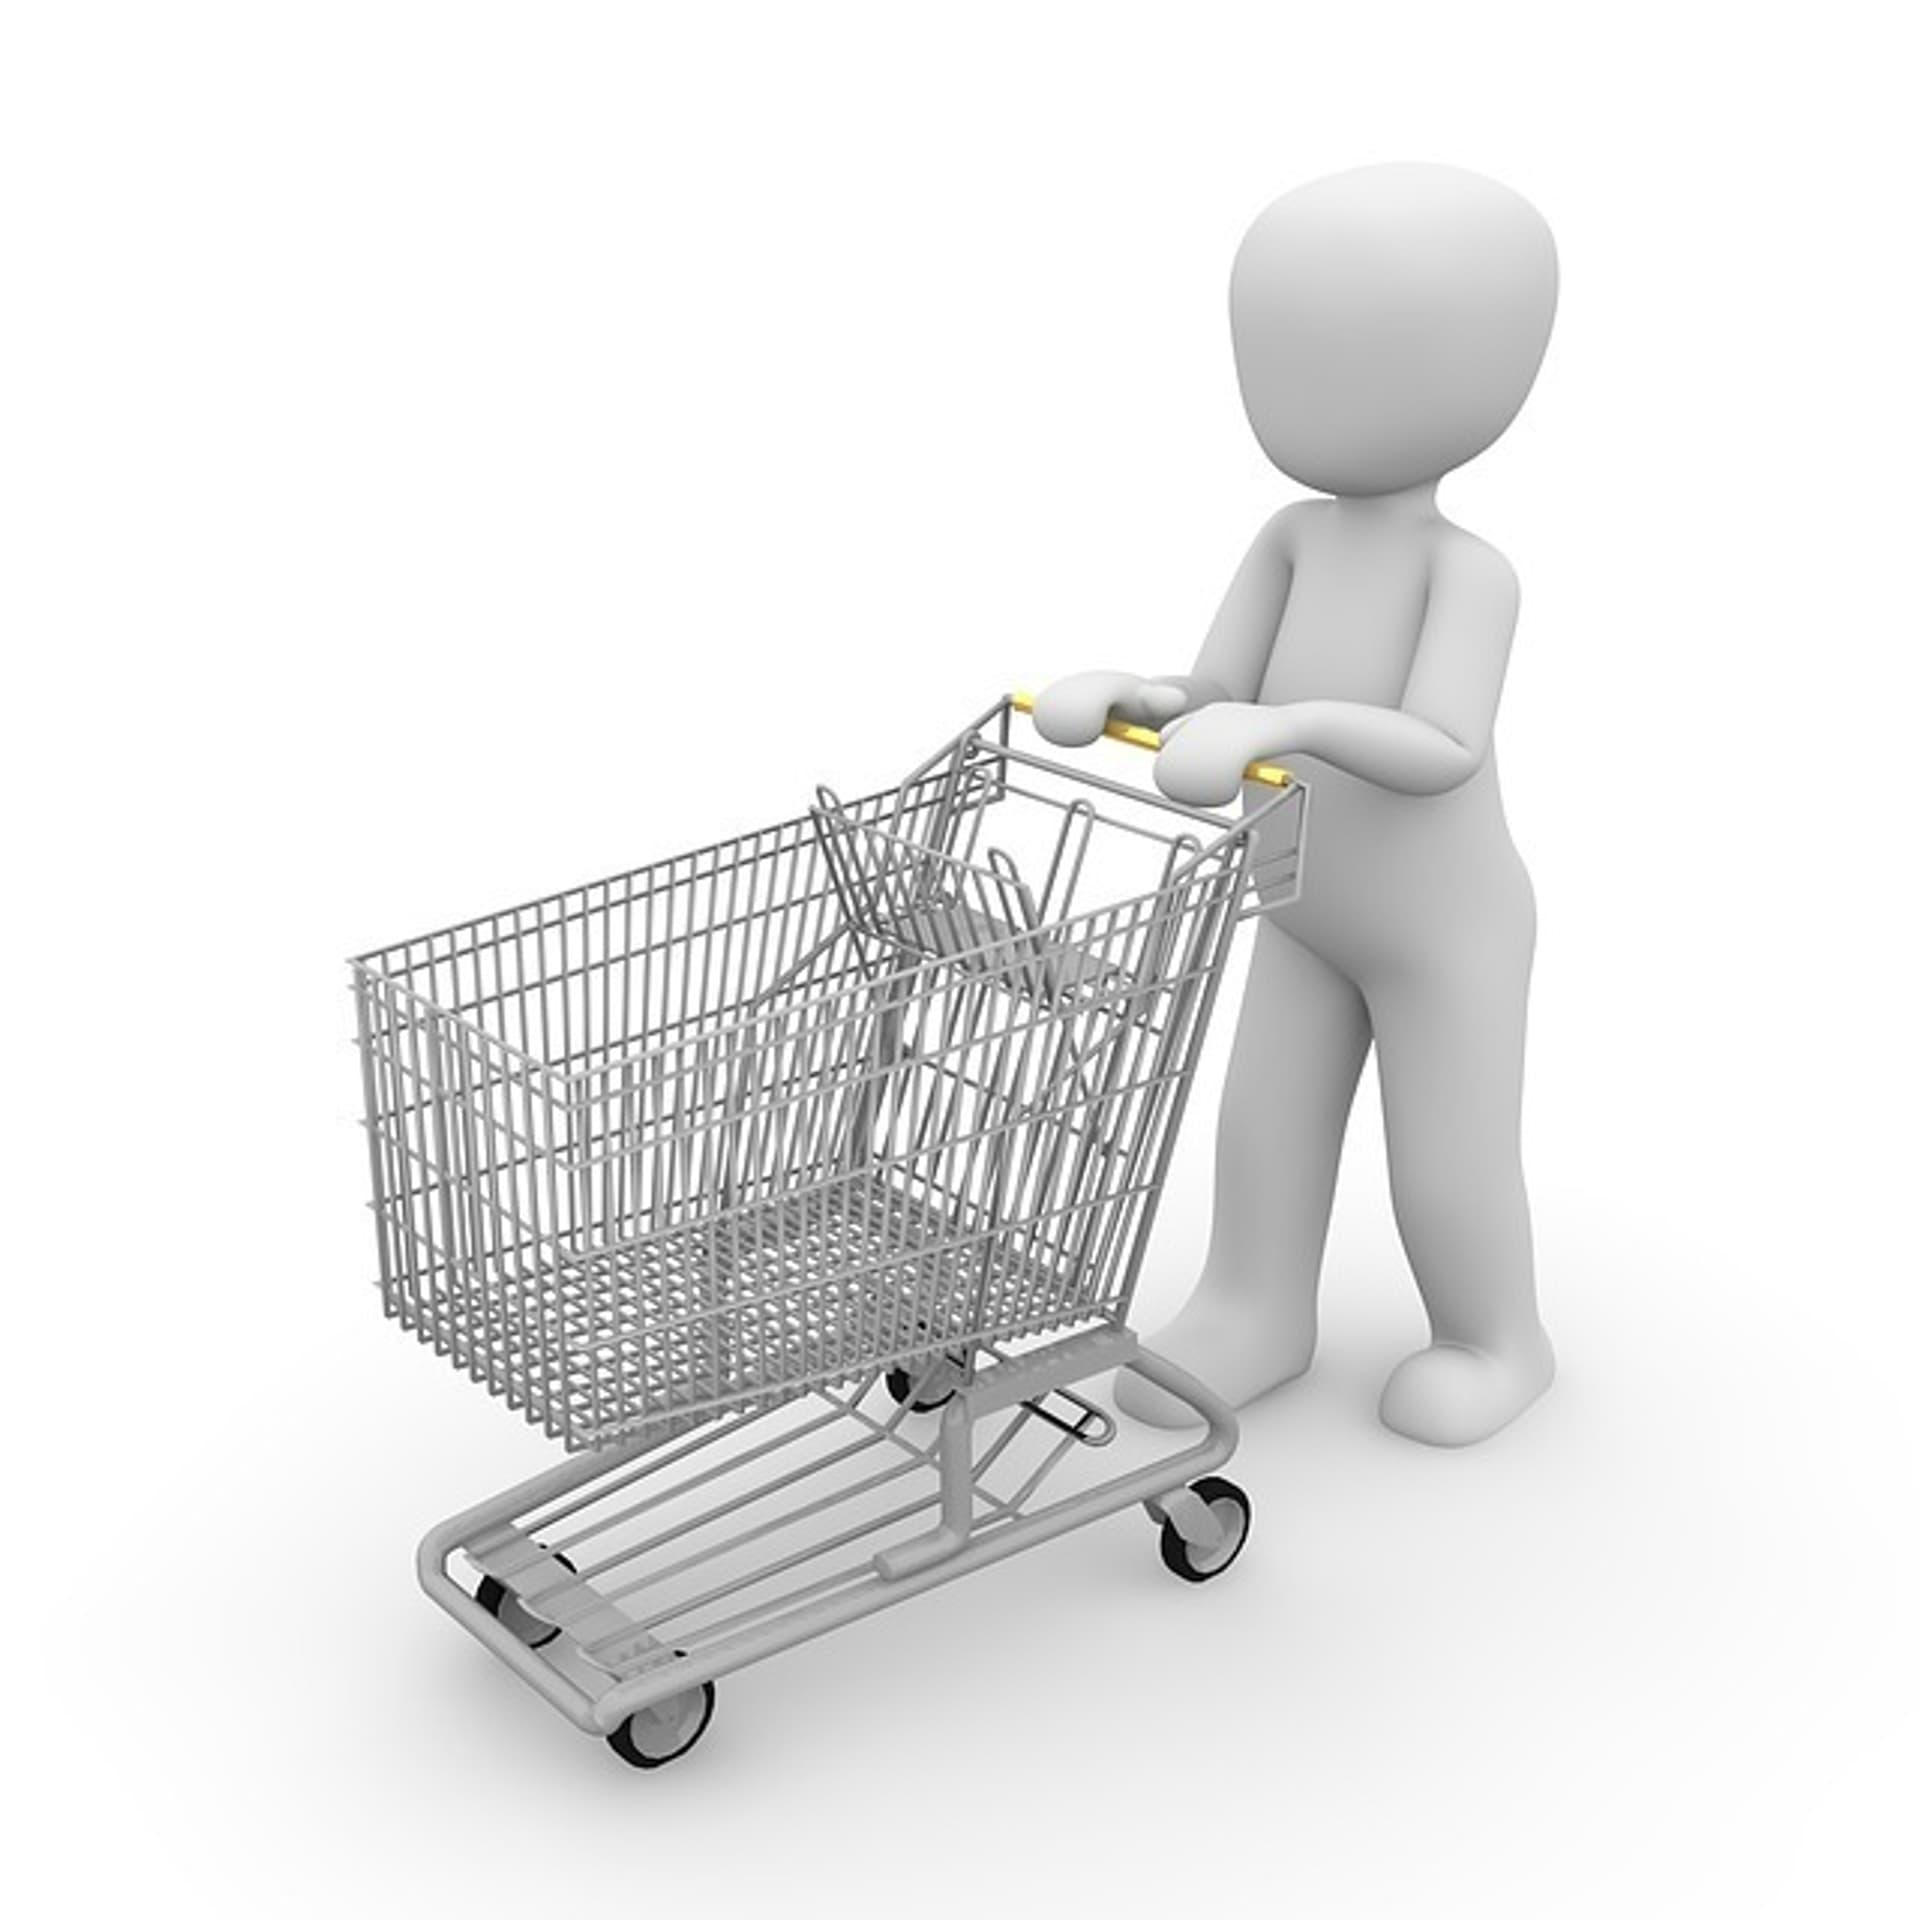 Einkaufen c Pixabay 3dman eu